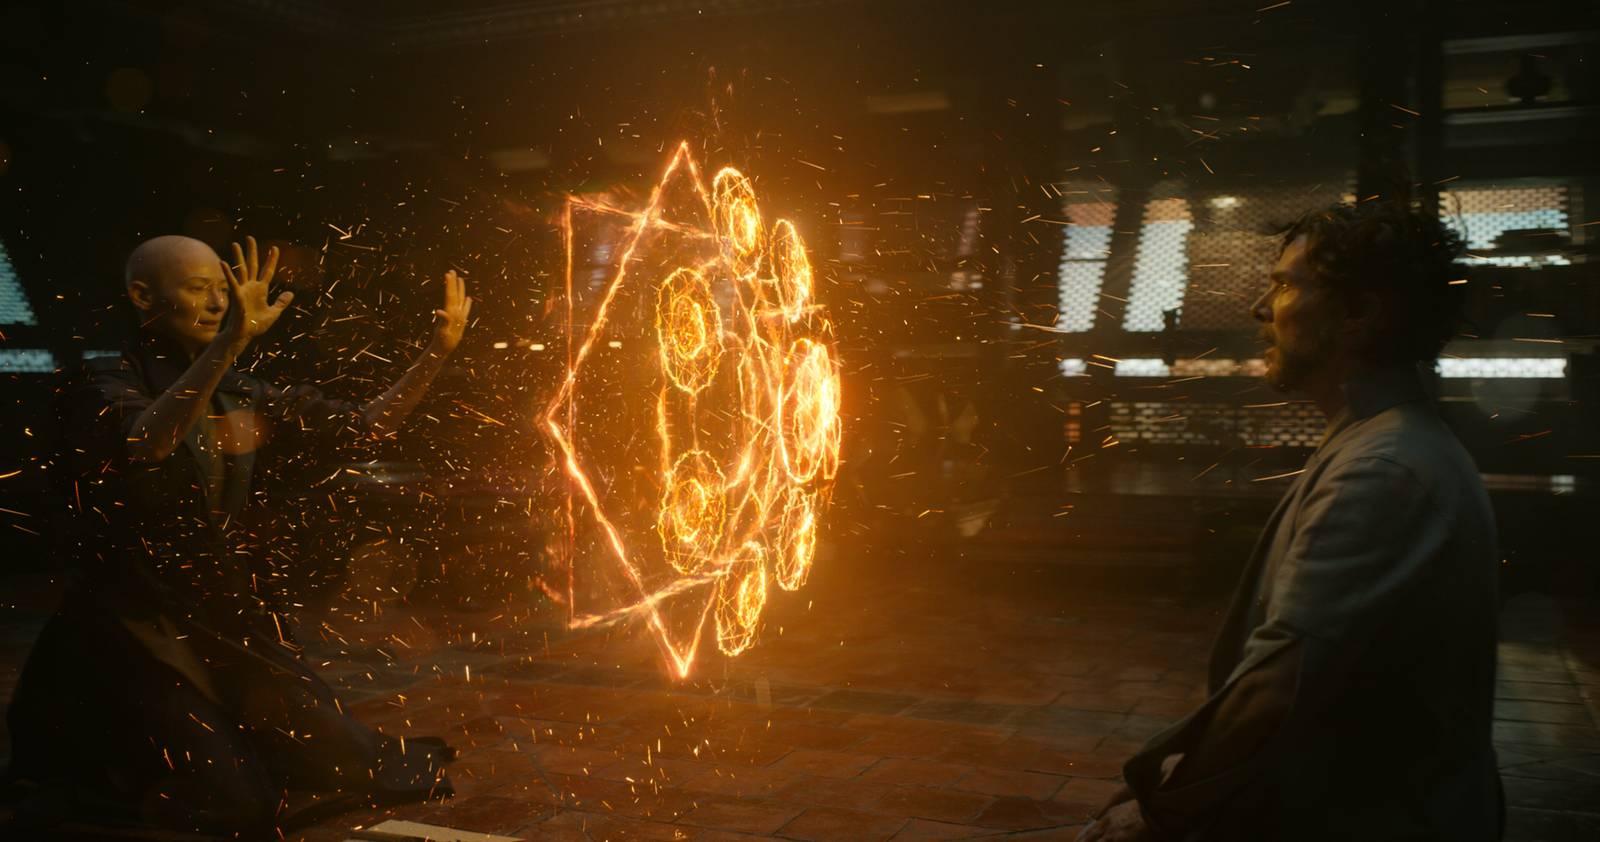 Recenzia filmu Doctor Strange (2016)